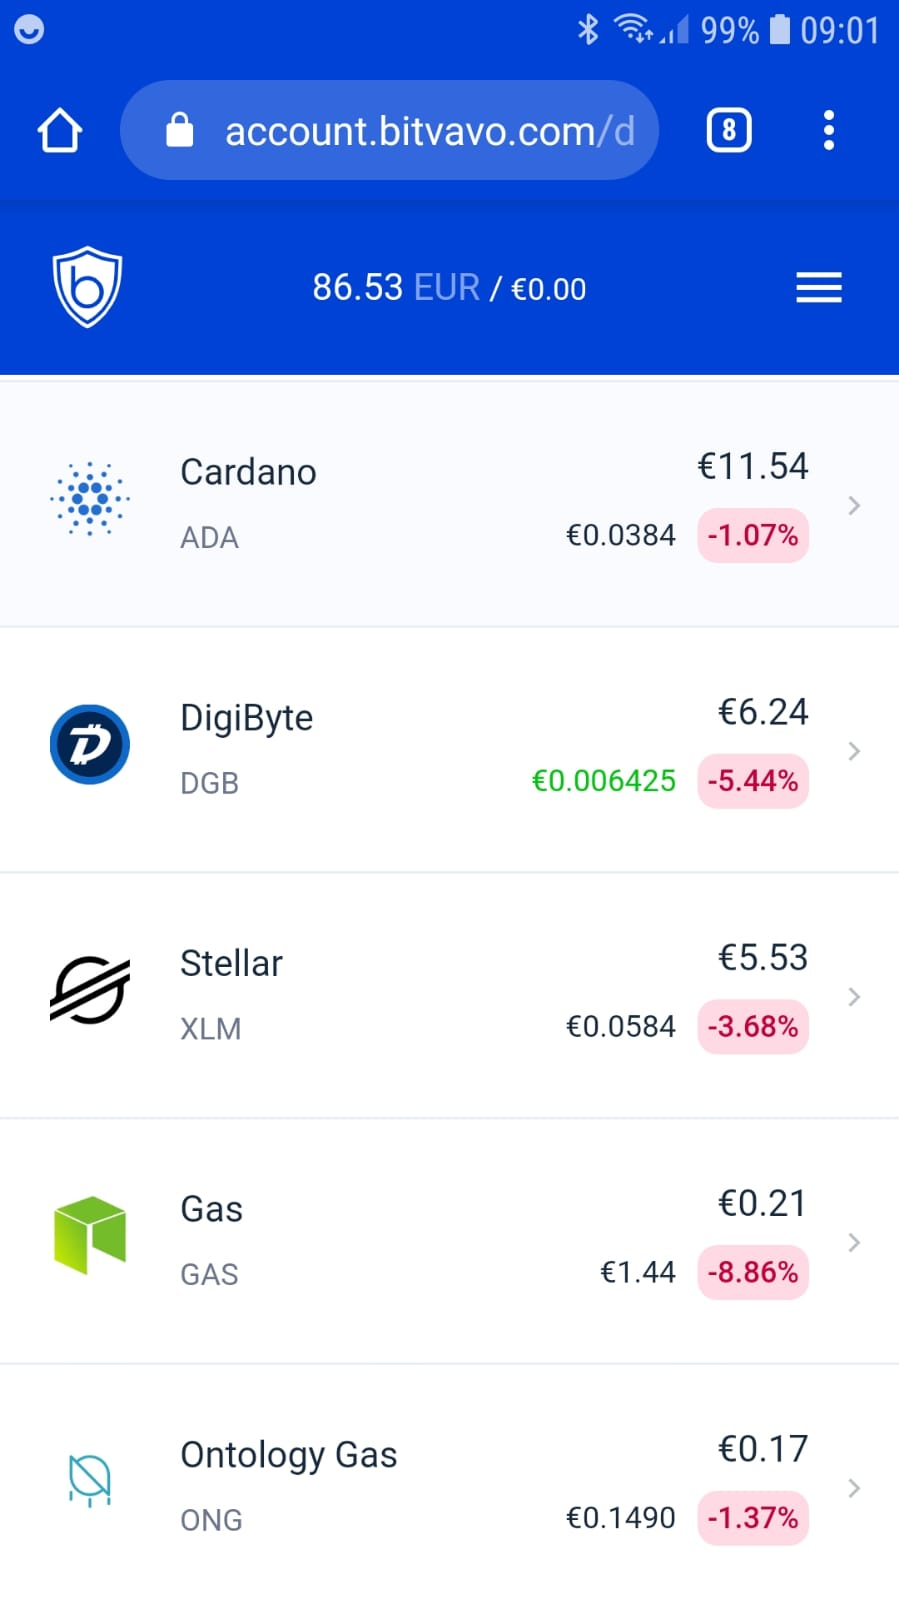 Ouders kopen crypto screenshot